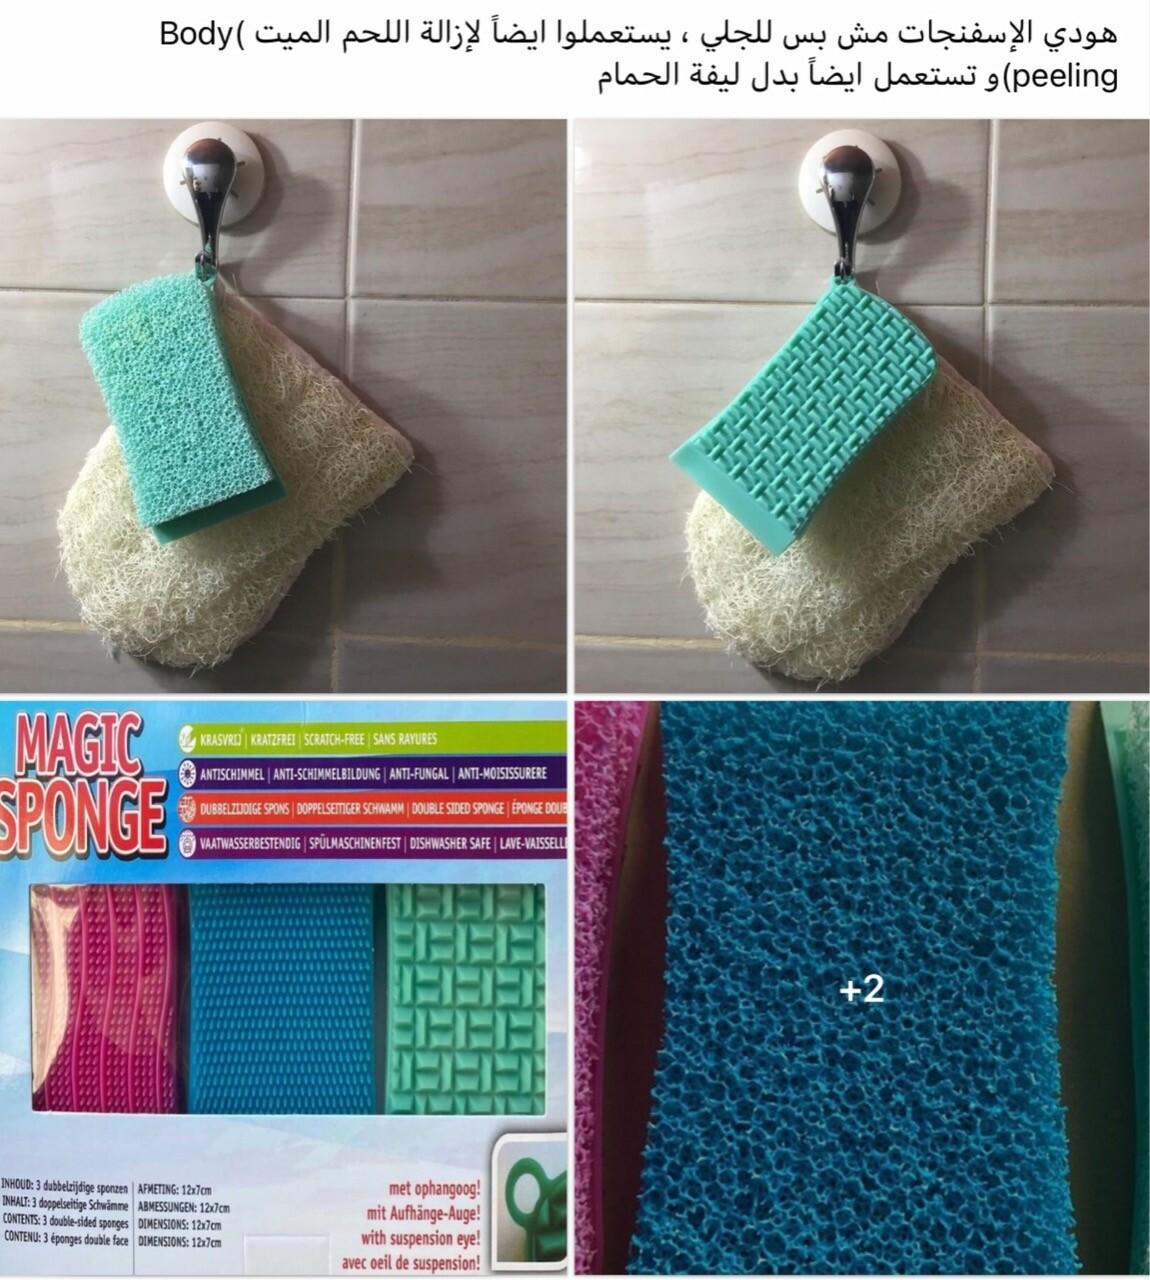 3-Pcs Silicone Sponge